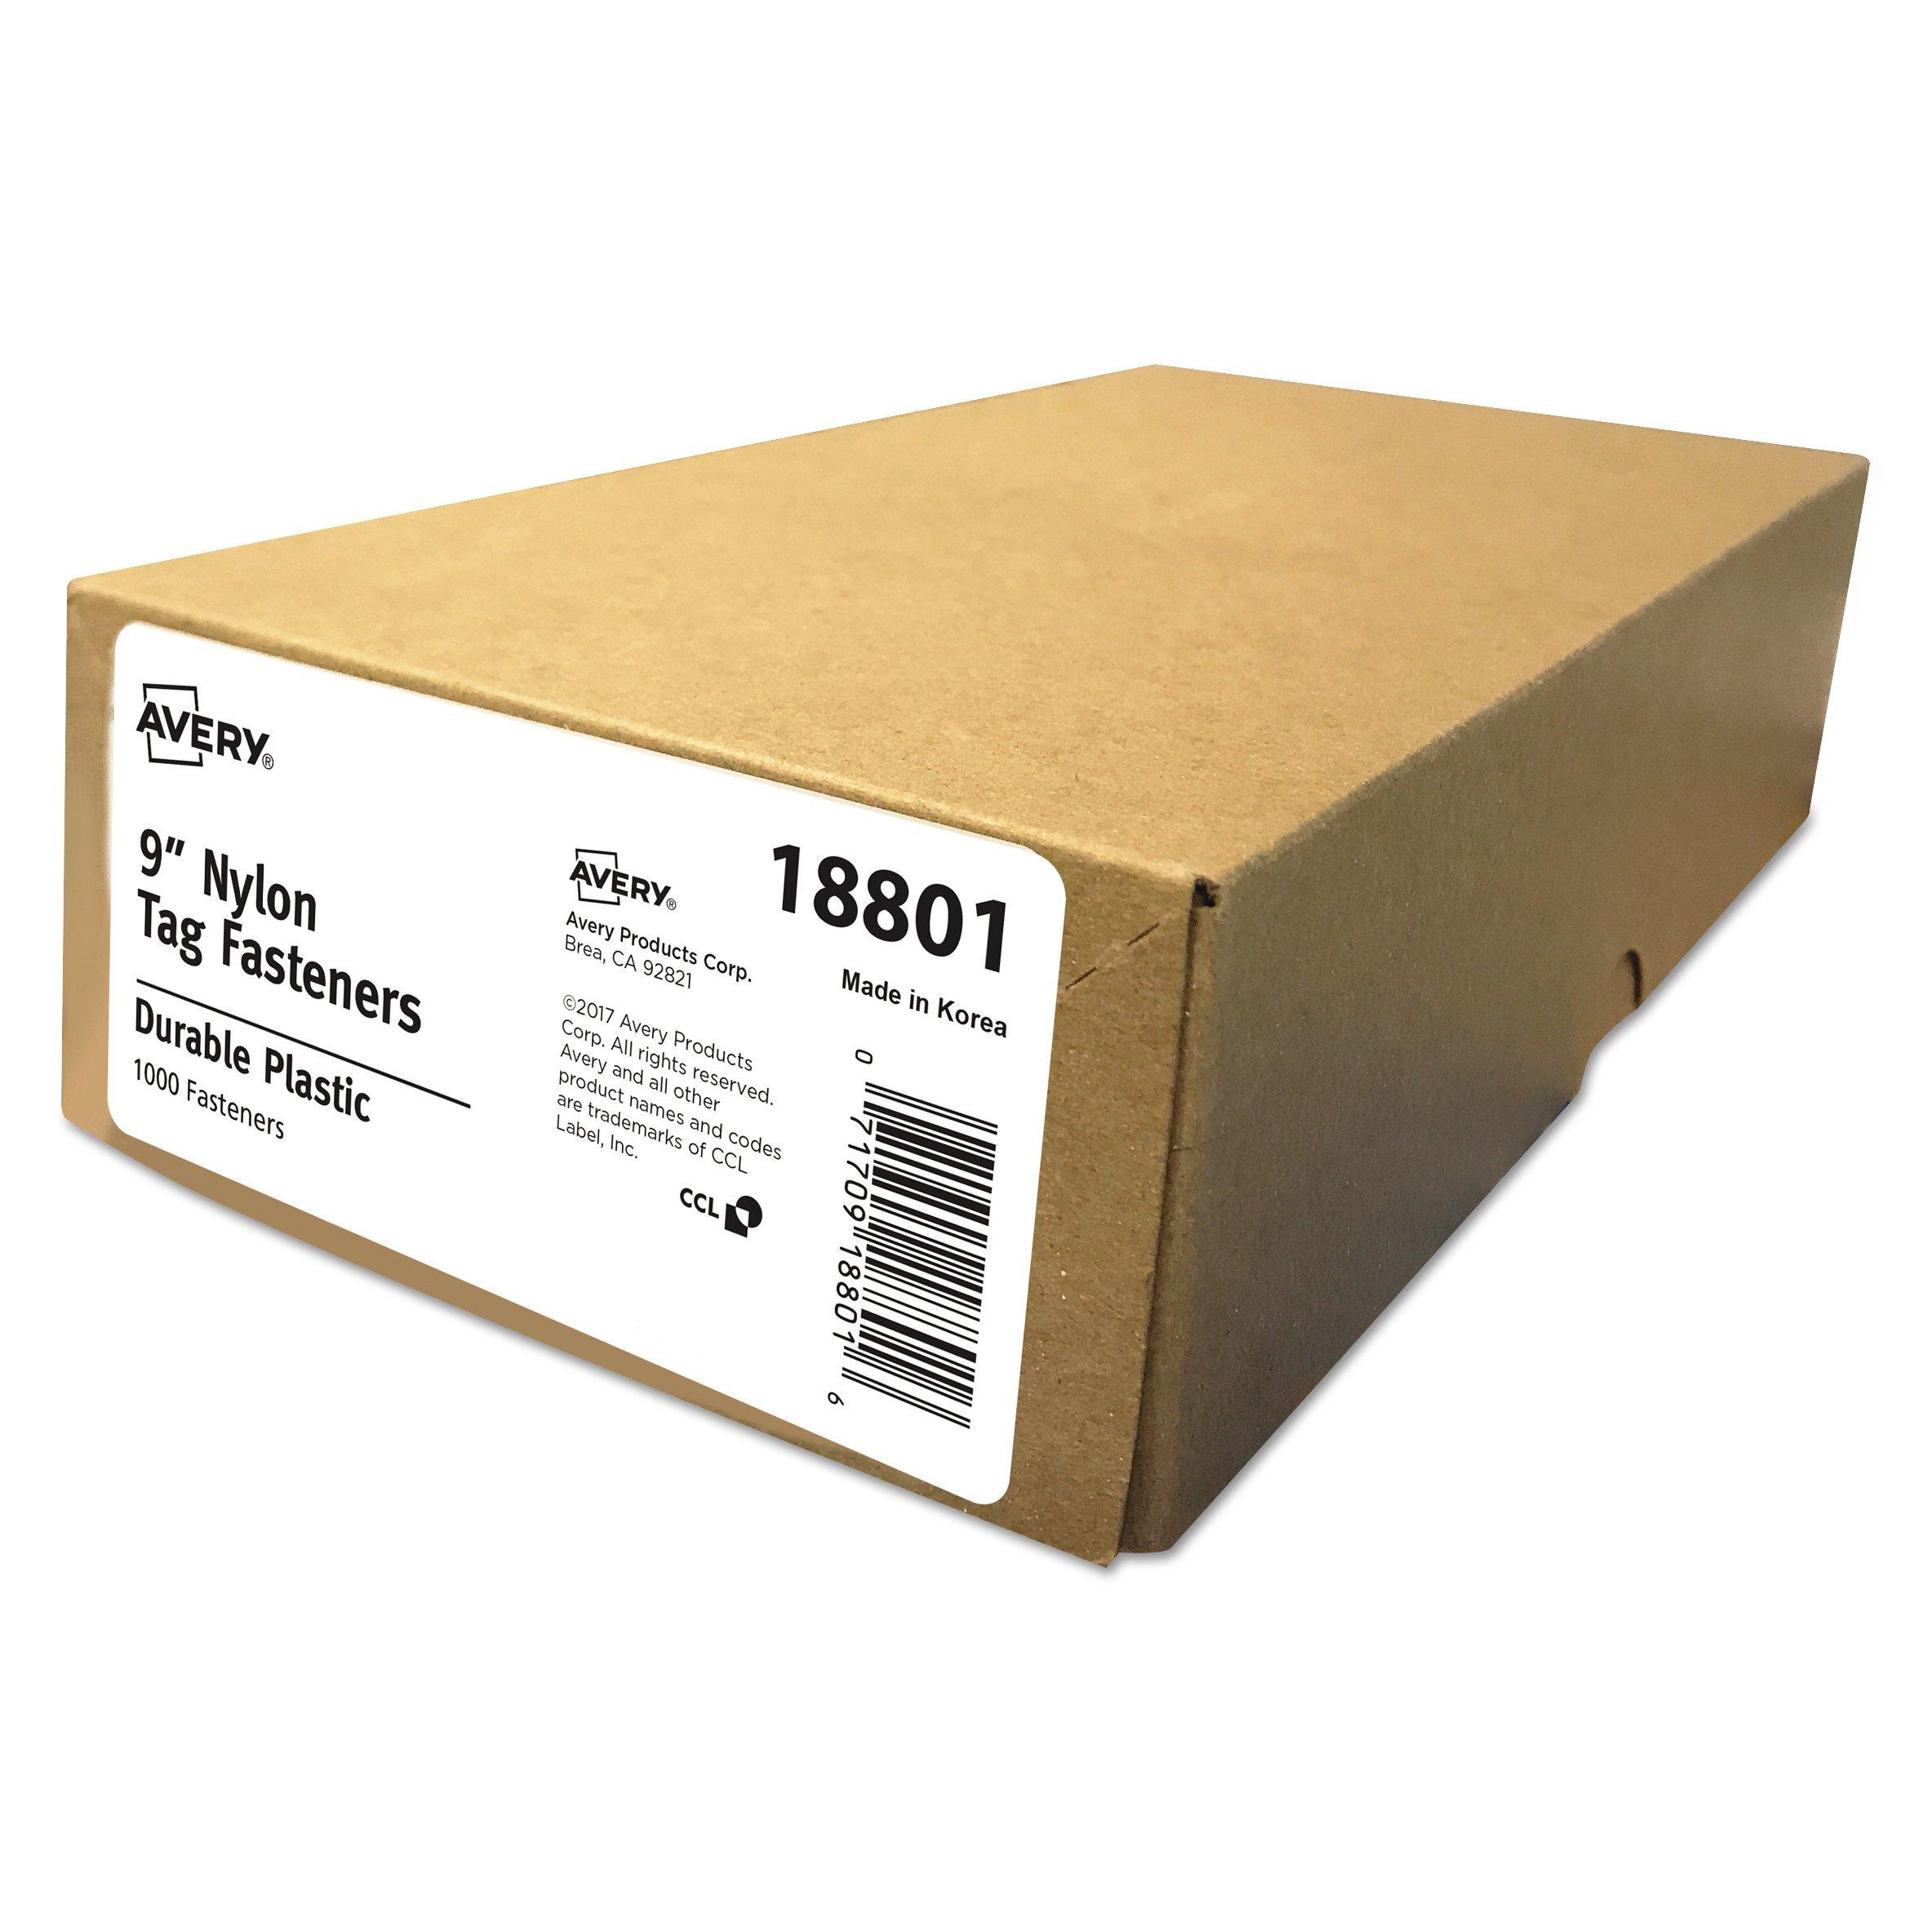 Avery 18801 Nylon Tag Fasteners, Weatherproof, 9'' Long (Box of 1000)